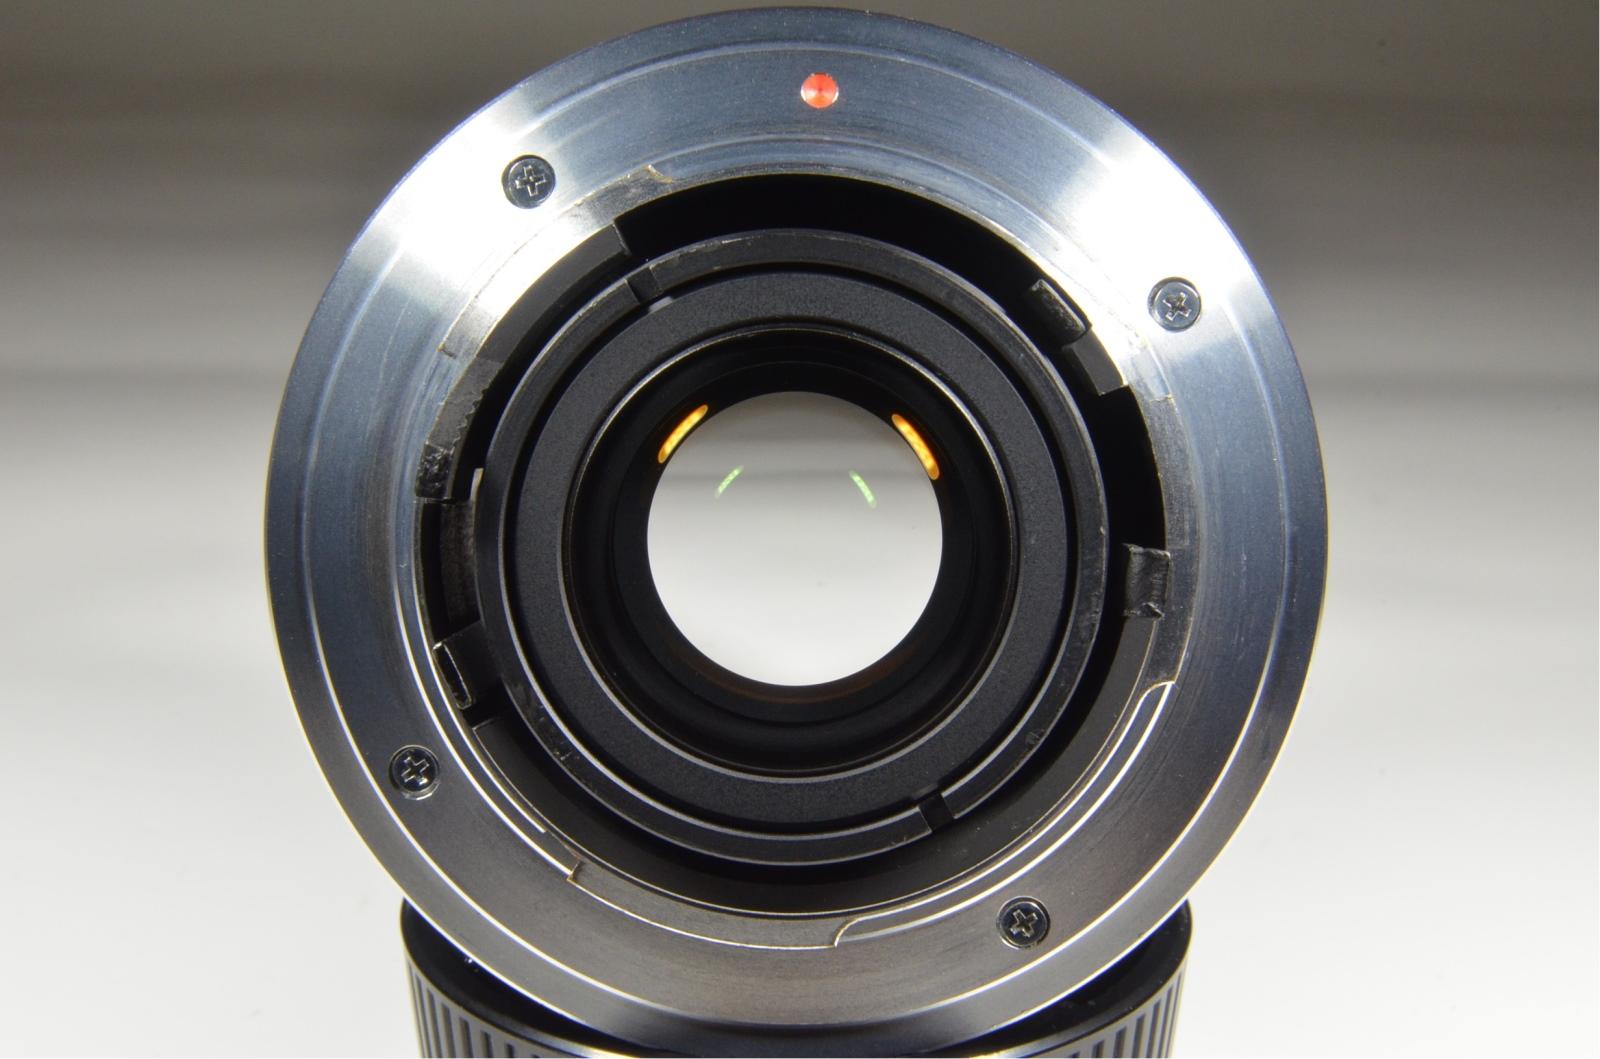 contax carl zeiss planar t* 85mm f1.4 aeg with mutar i 2x